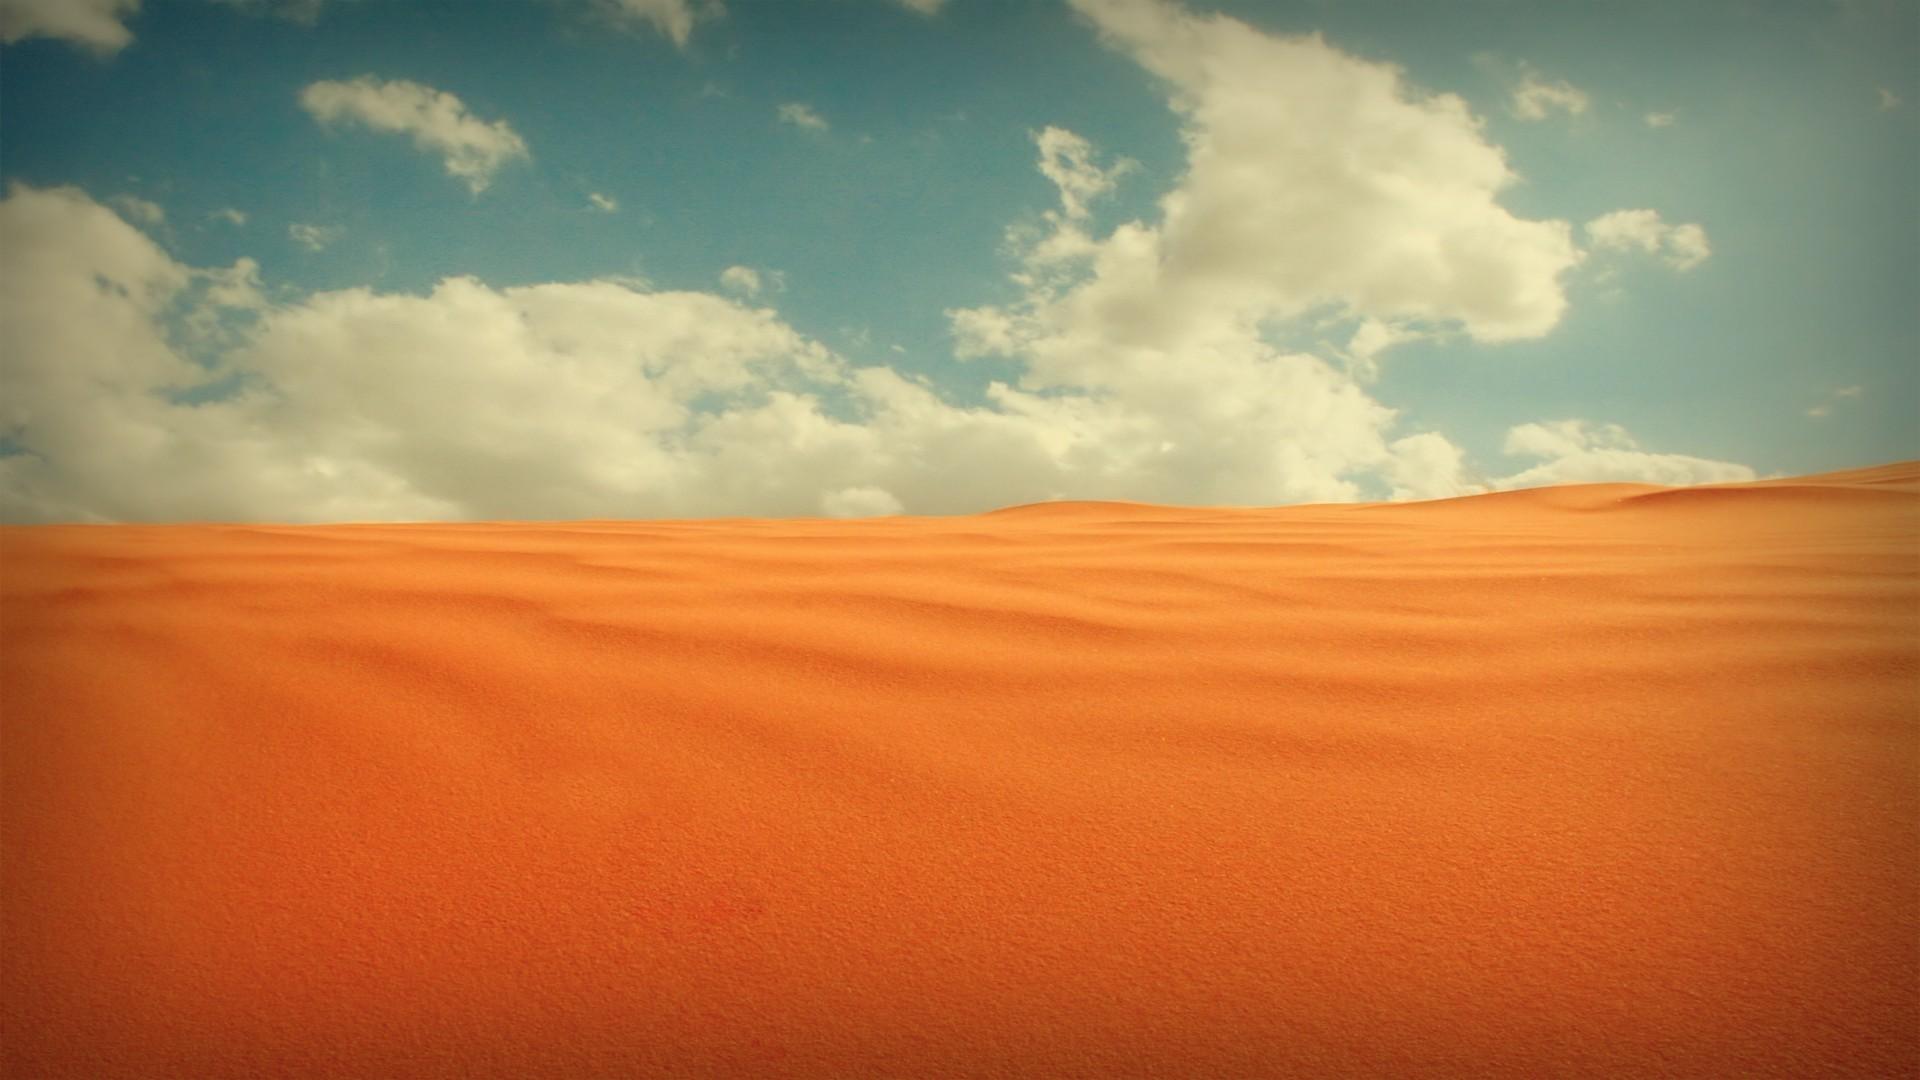 солнце каньон песок the sun canyon sand  № 2562999 загрузить